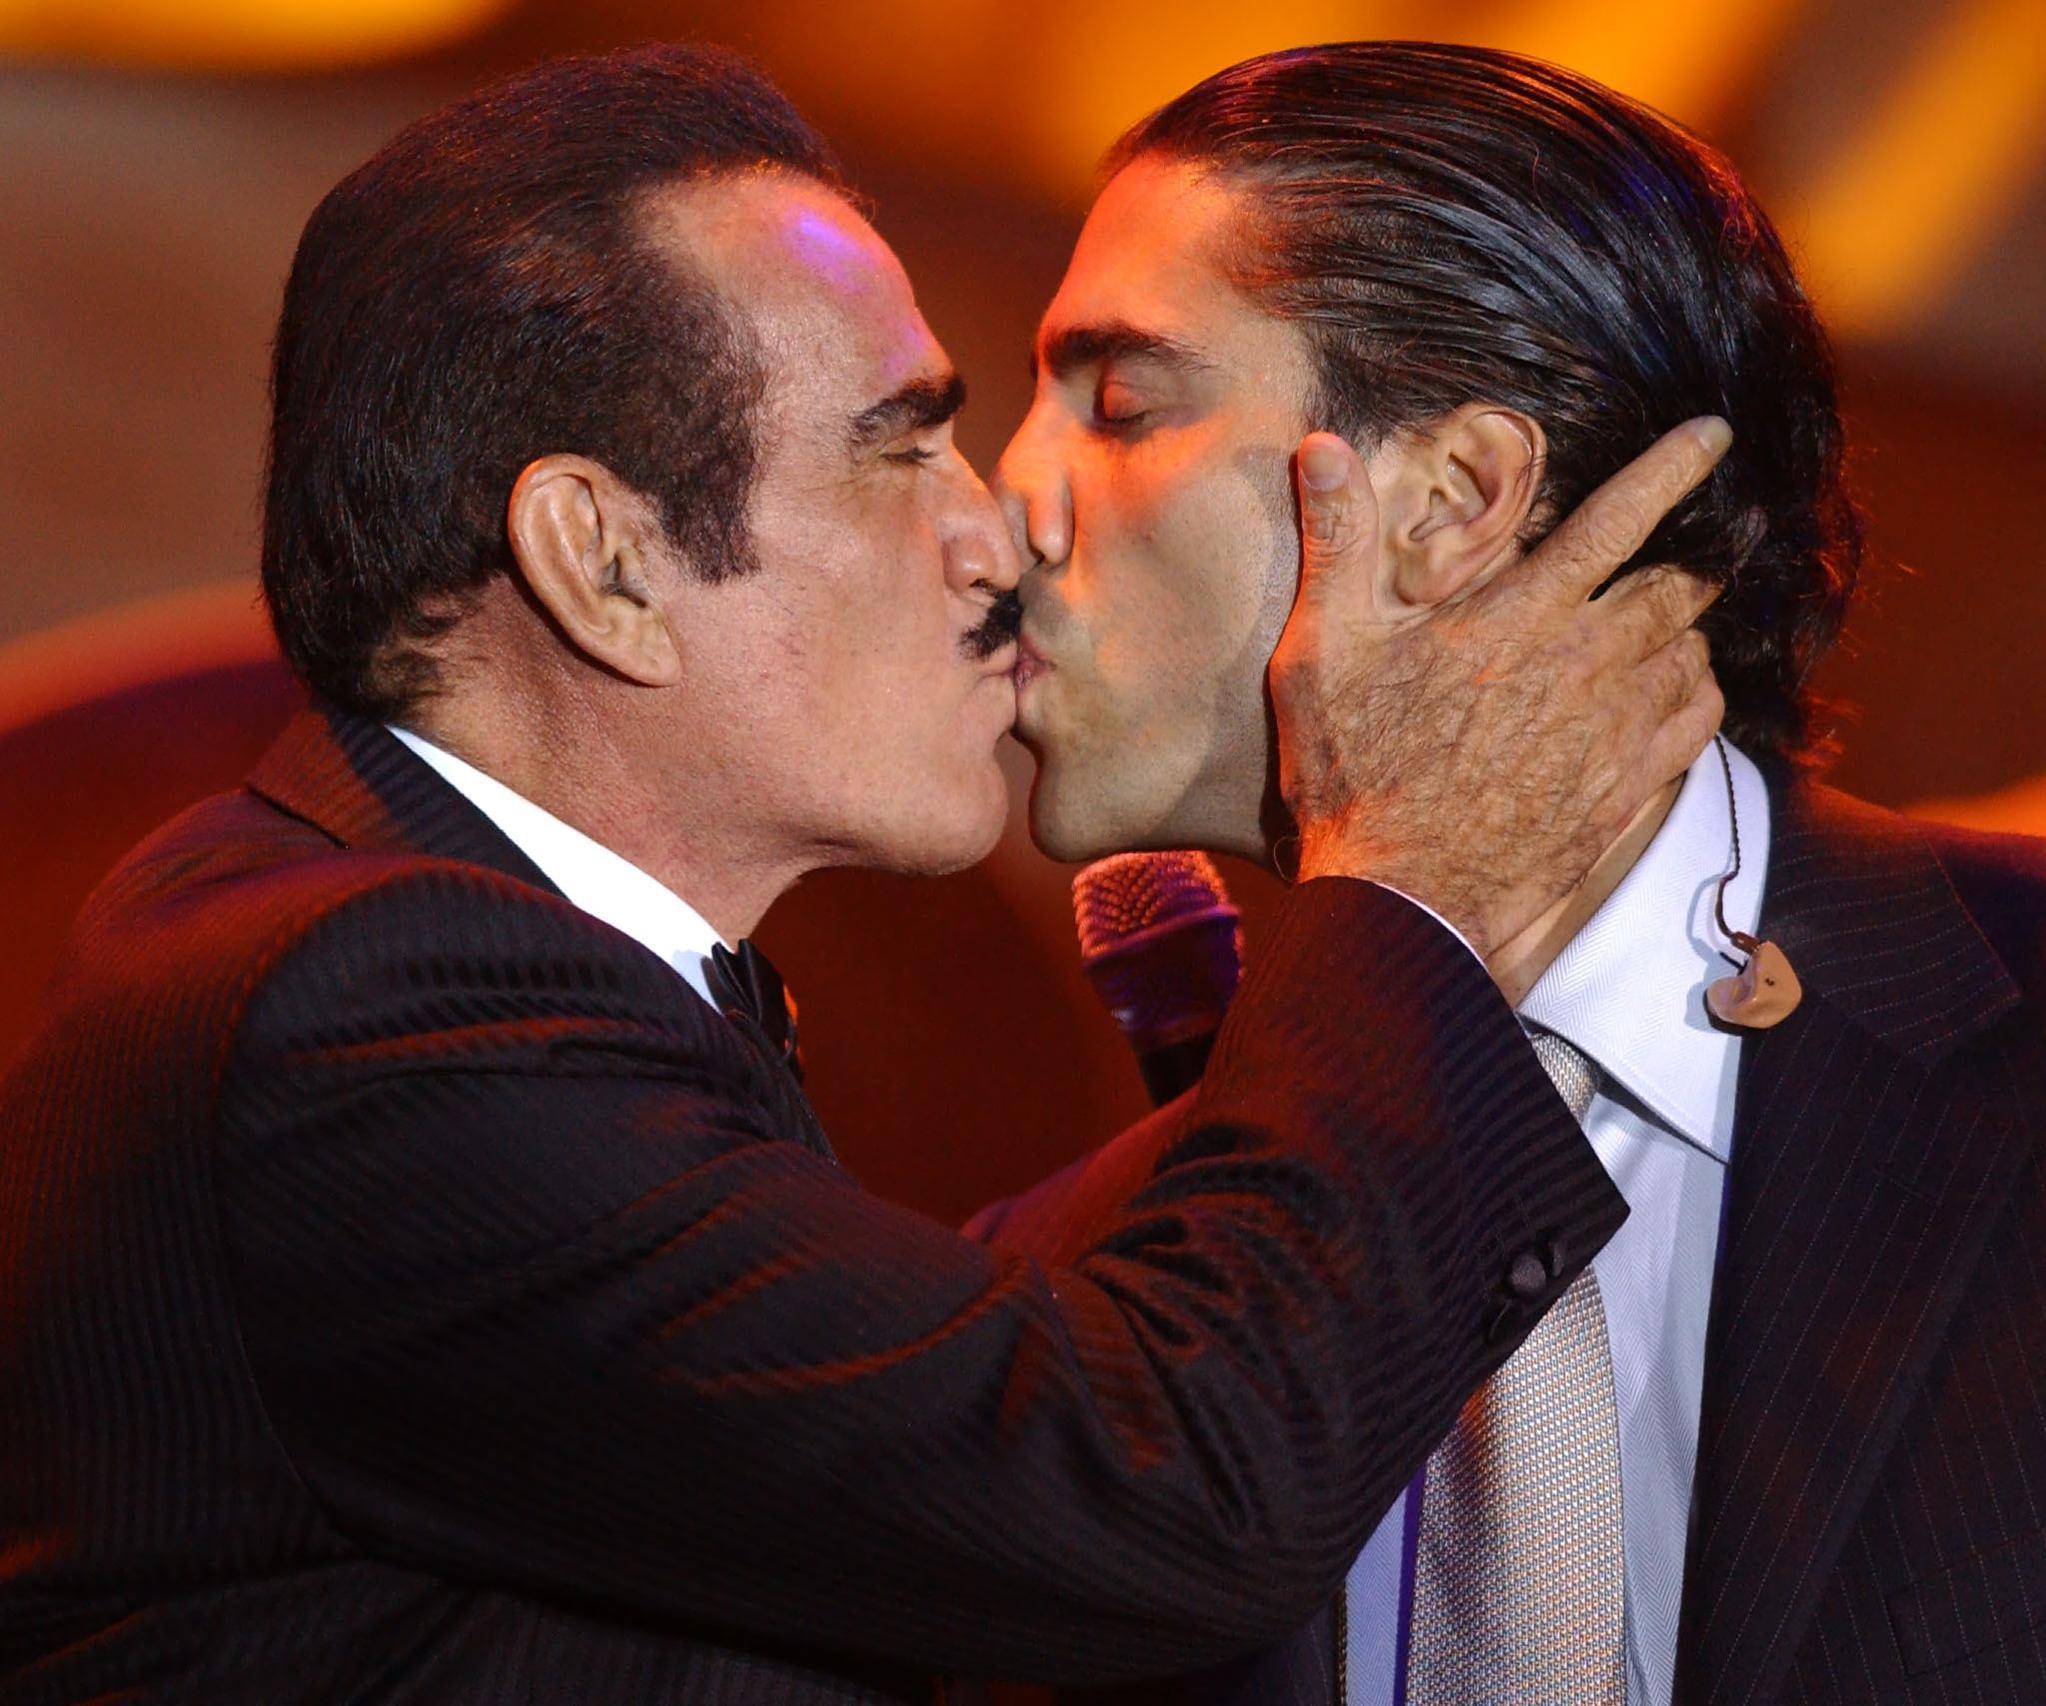 Mexican Ranchero singer Vicente Fernandez (L) kiss